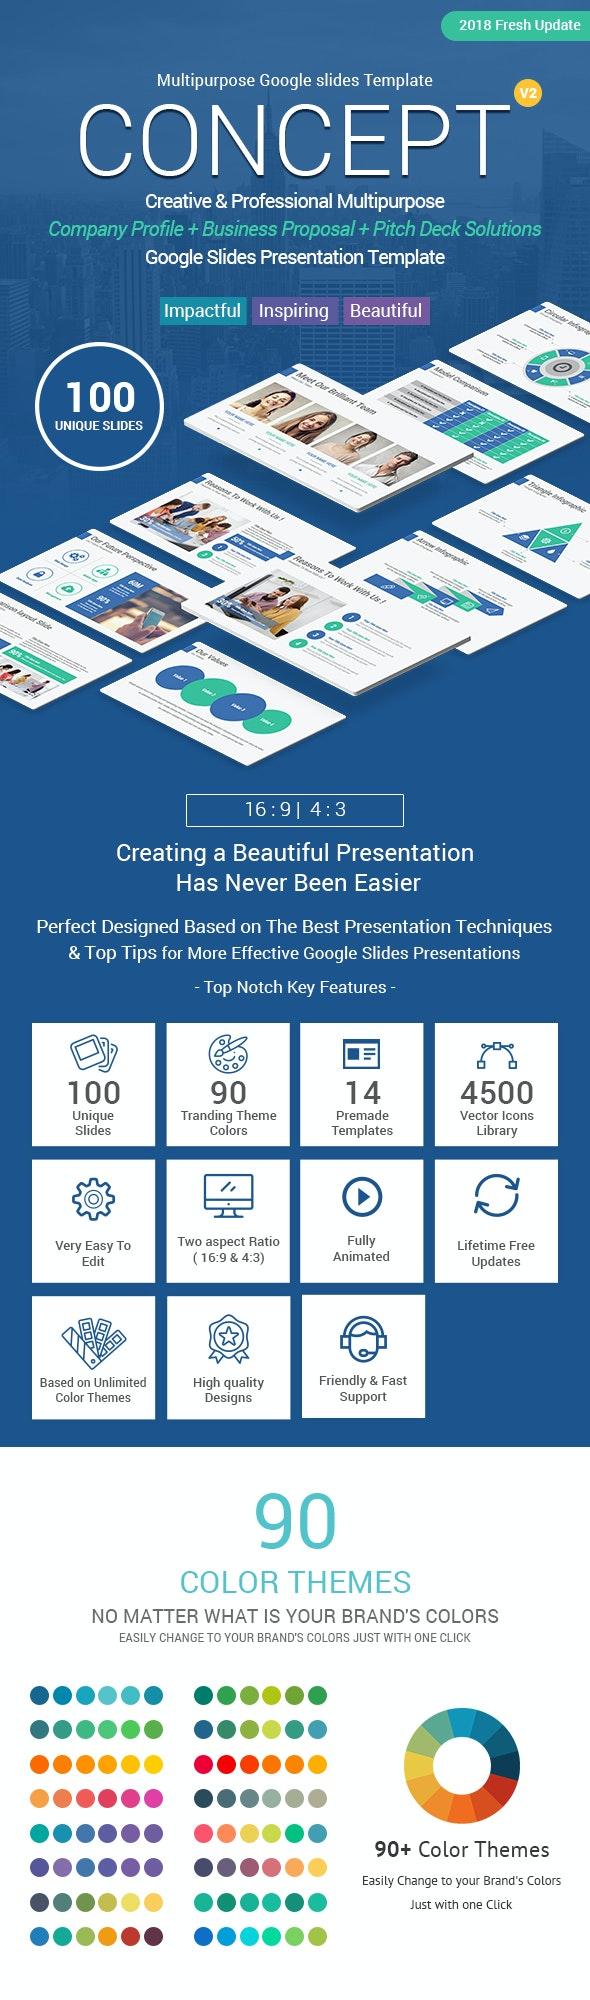 Concept Business Solutions Google Slides Template Theme - Google Slides Presentation Templates